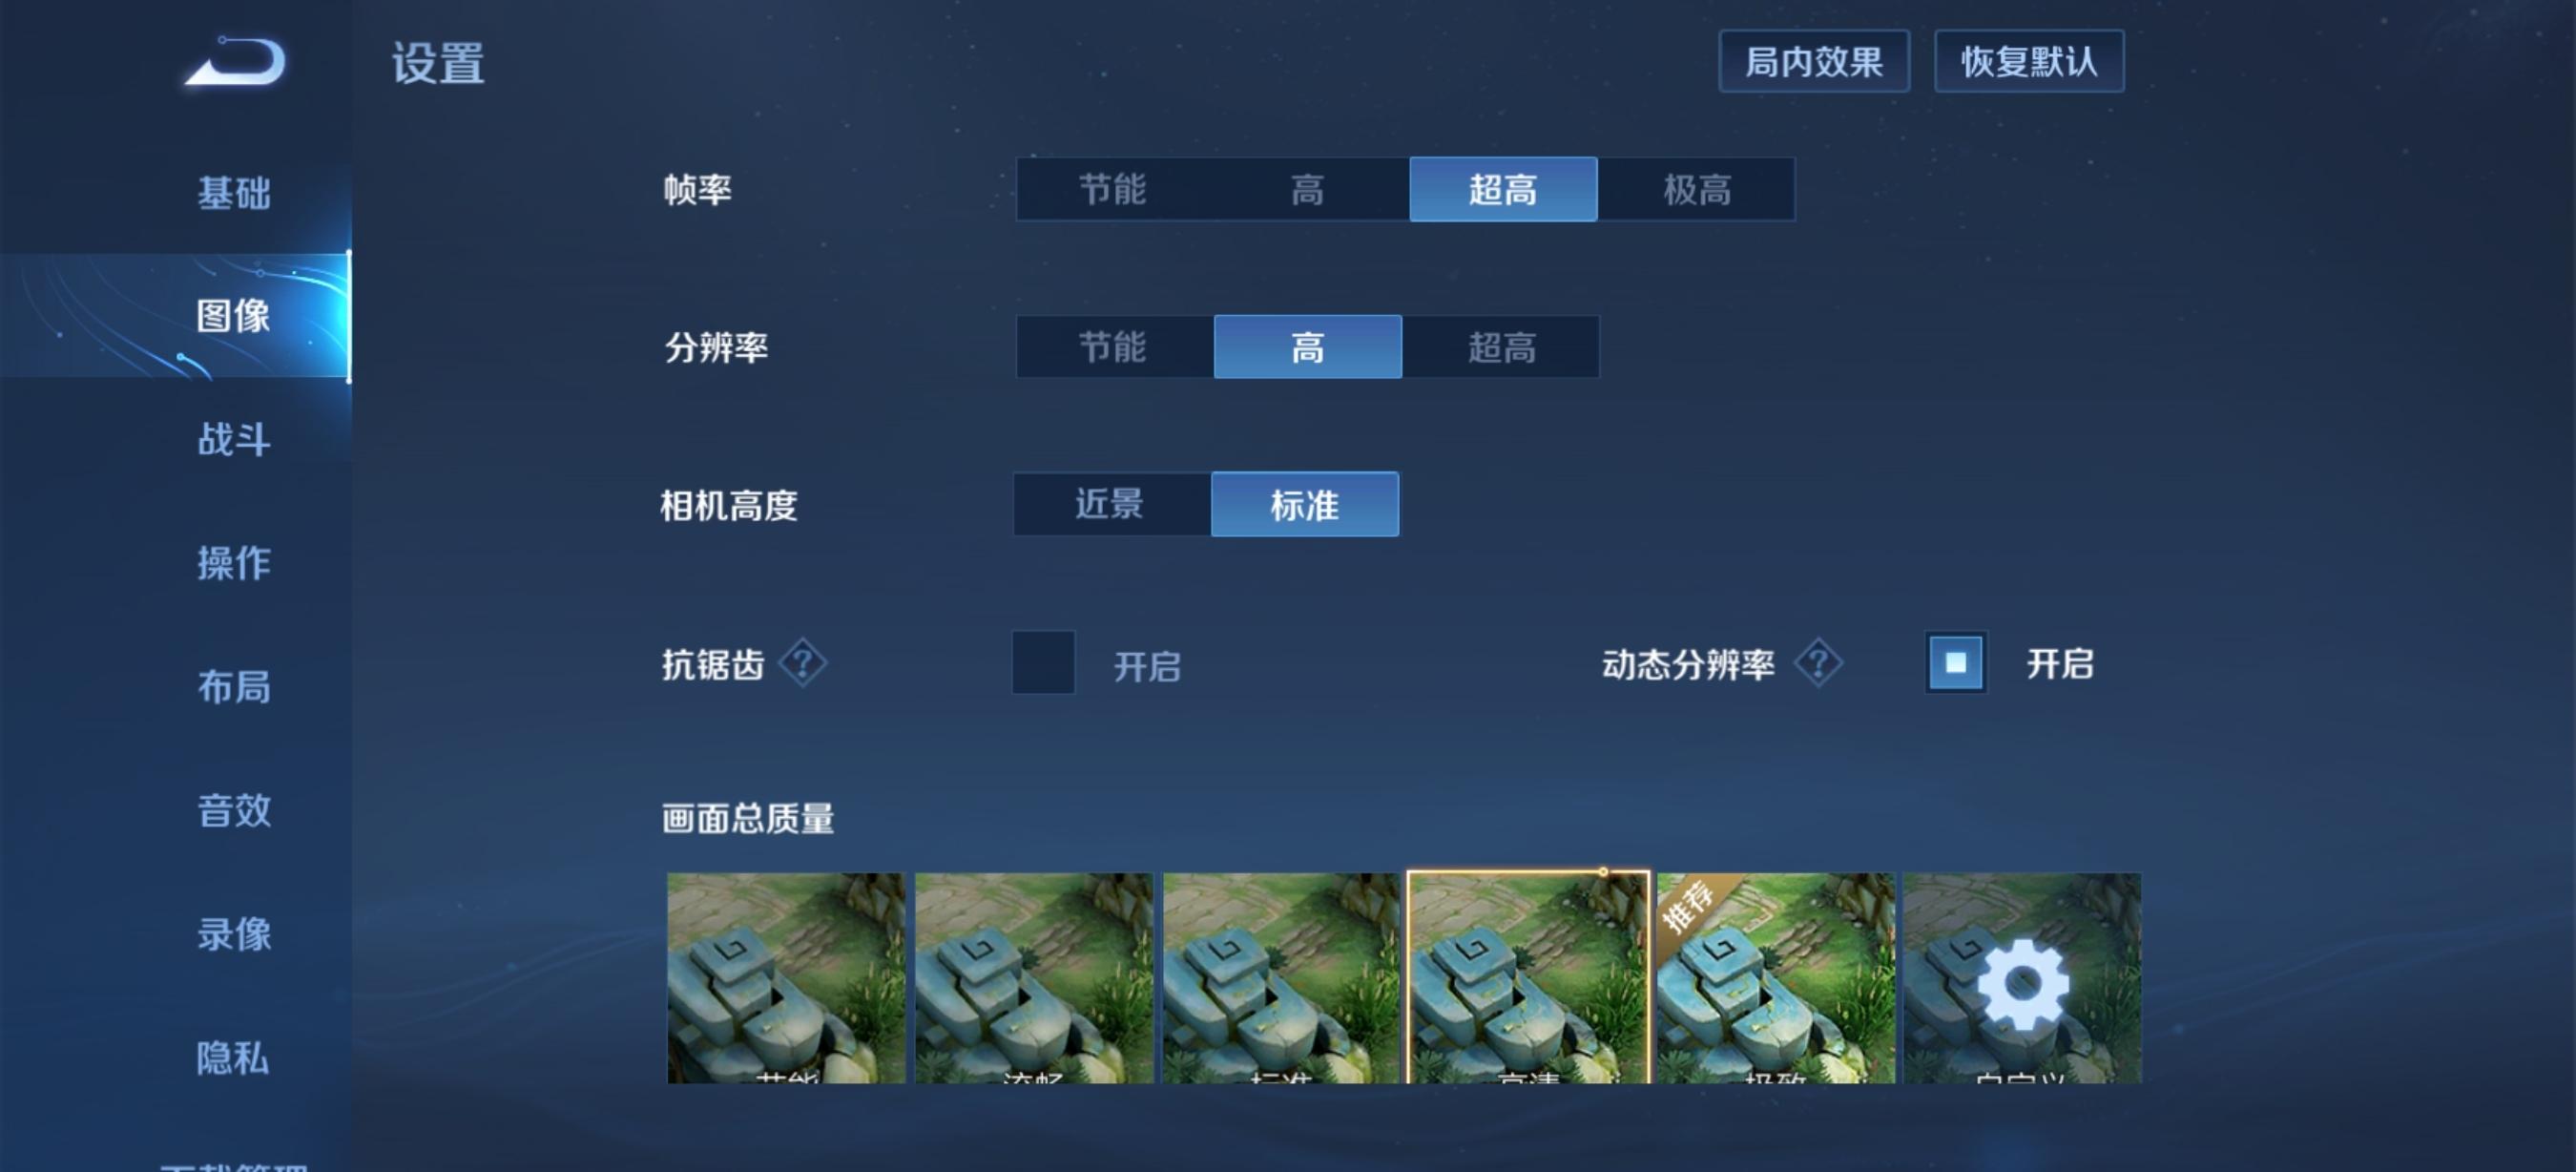 Screenshot_20211014_101319_com.tencent.tmgp.sgame.jpg